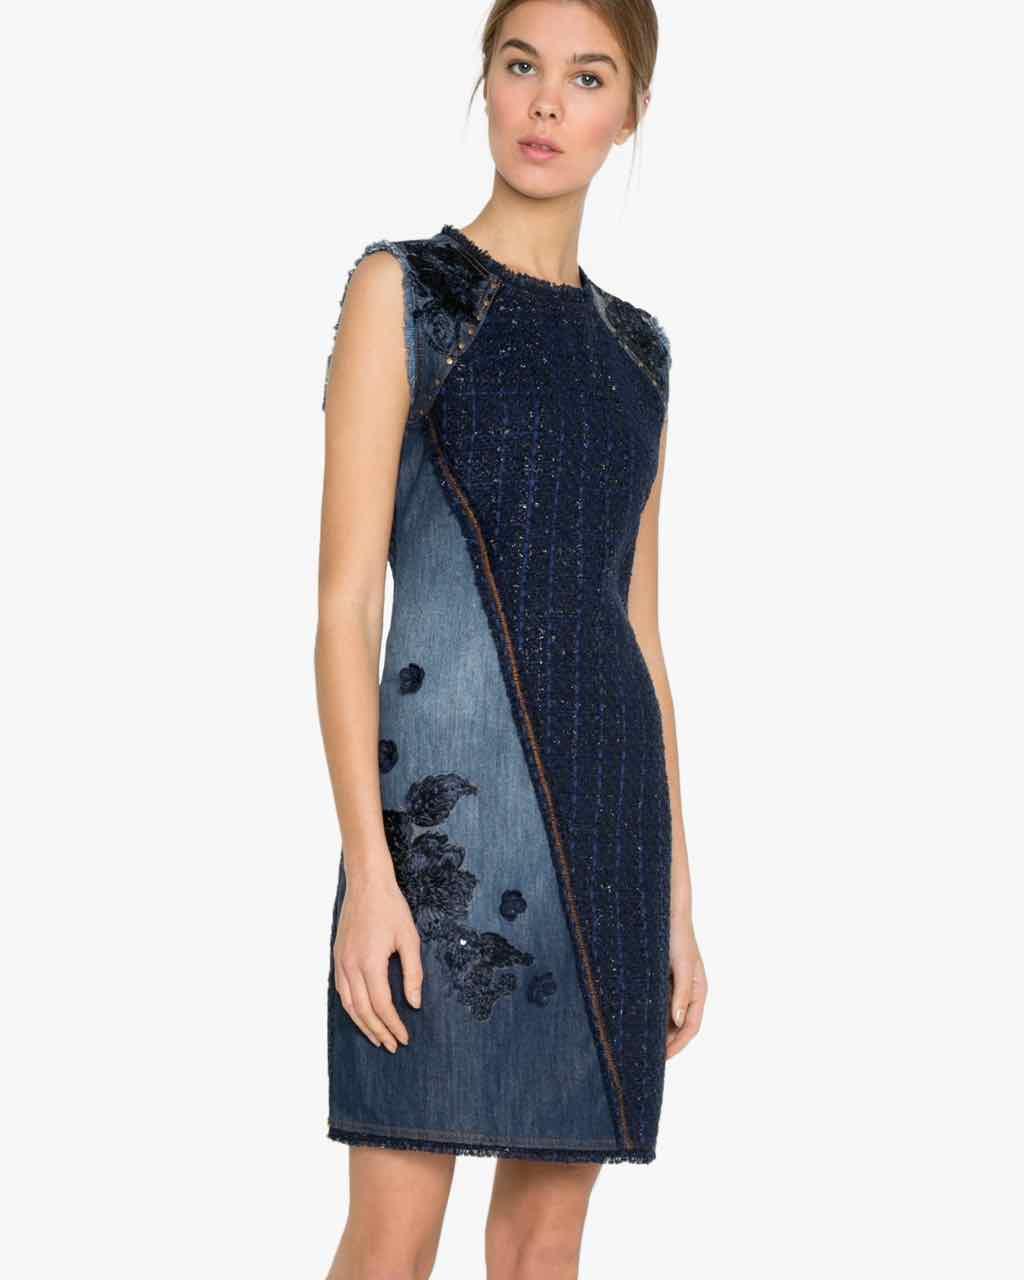 Desigual Dress Achille 17wwvd05 Blue Denim Buy Online